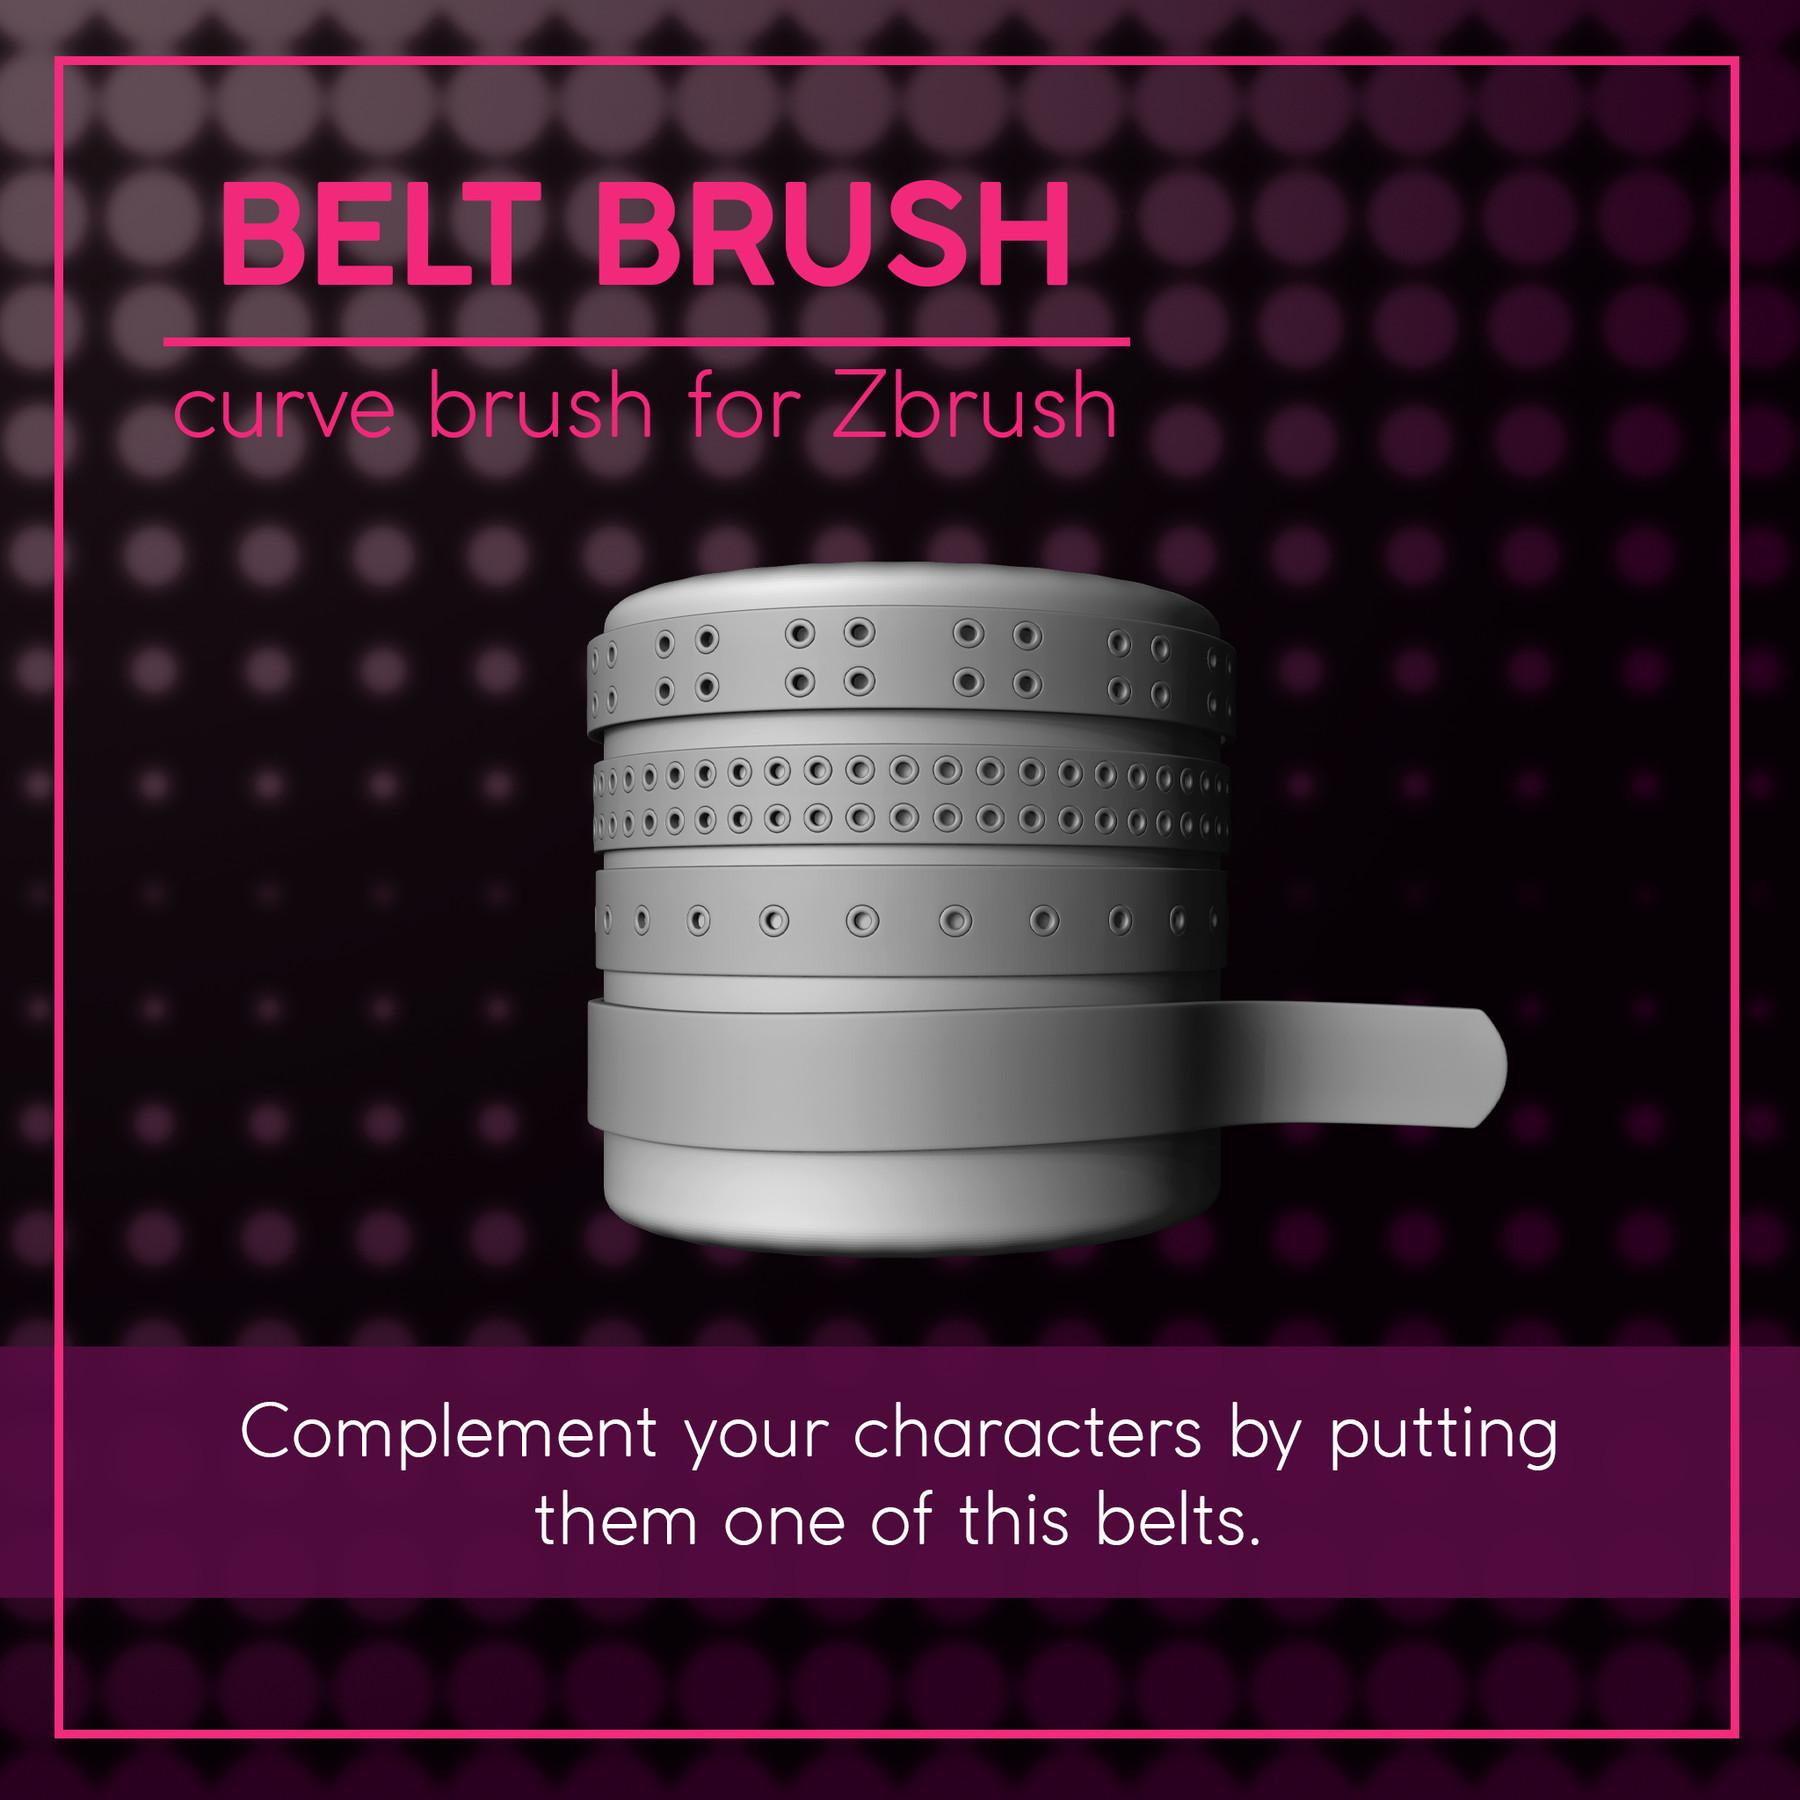 [IMM Brush] Basic Belt Curve Brush for Zbrush 2019 by Sergi Camprubí